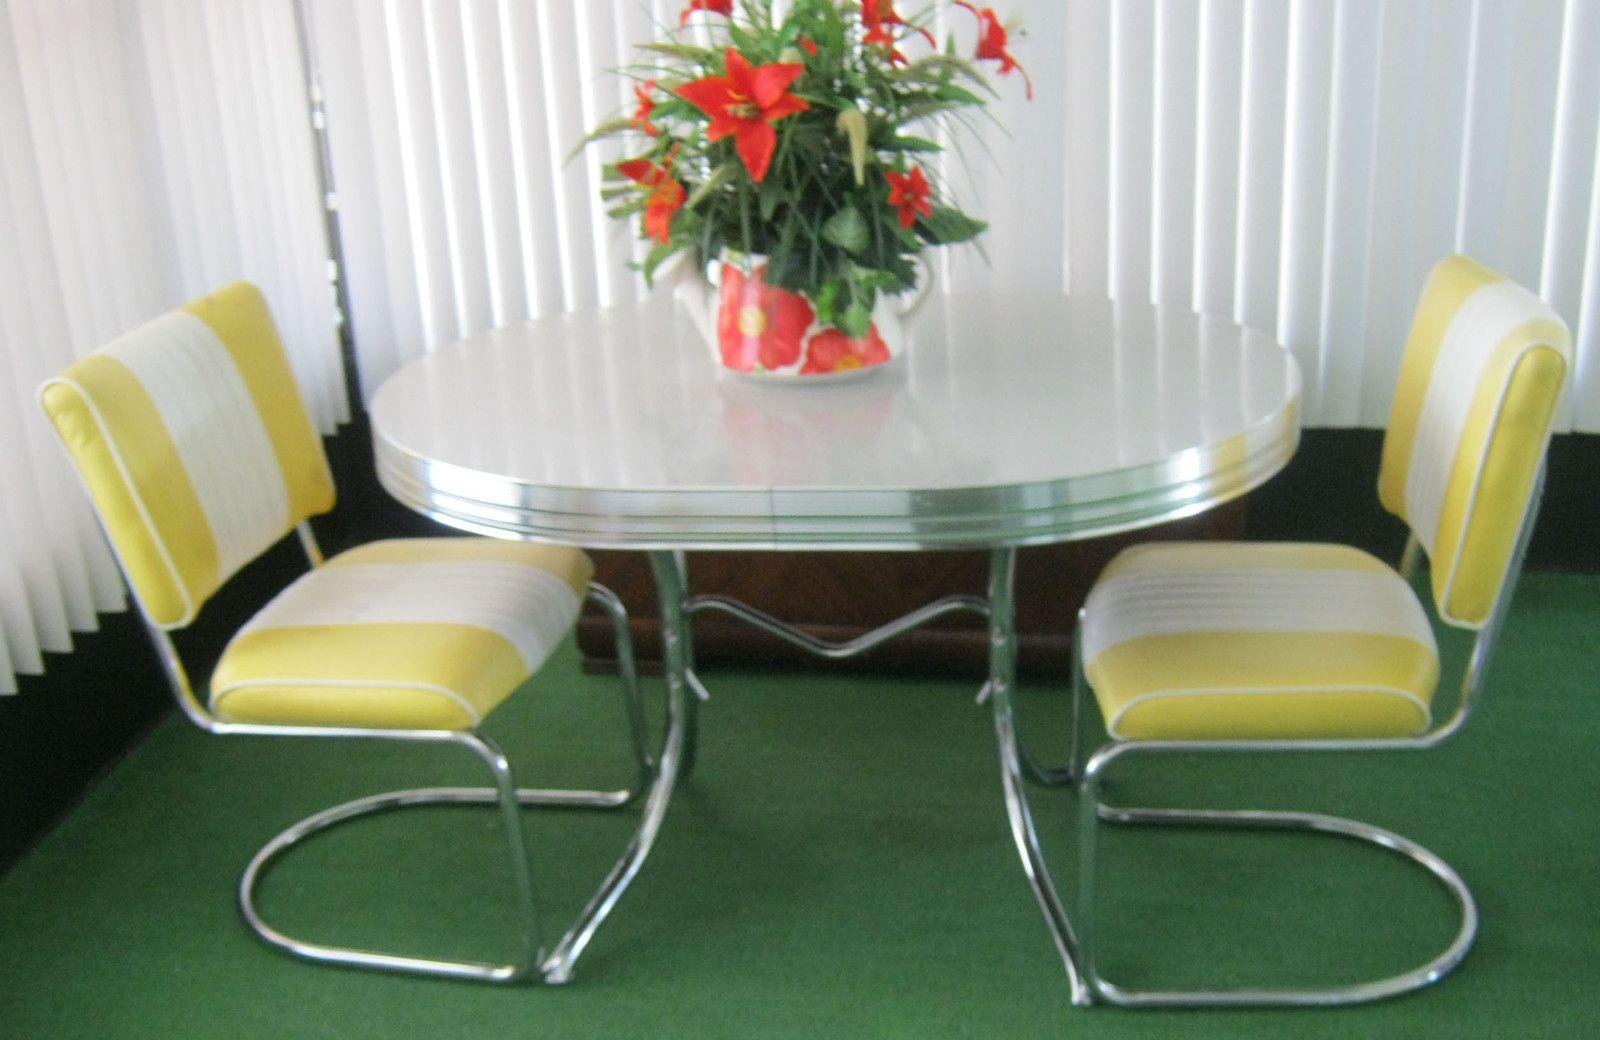 Vintage Retro 1950 S Chrome Gray Yellow Dining Kitchen Table Leaf 2 Chairs Retro Kitchen Tables Vintage Kitchen Accessories Dining Table In Kitchen